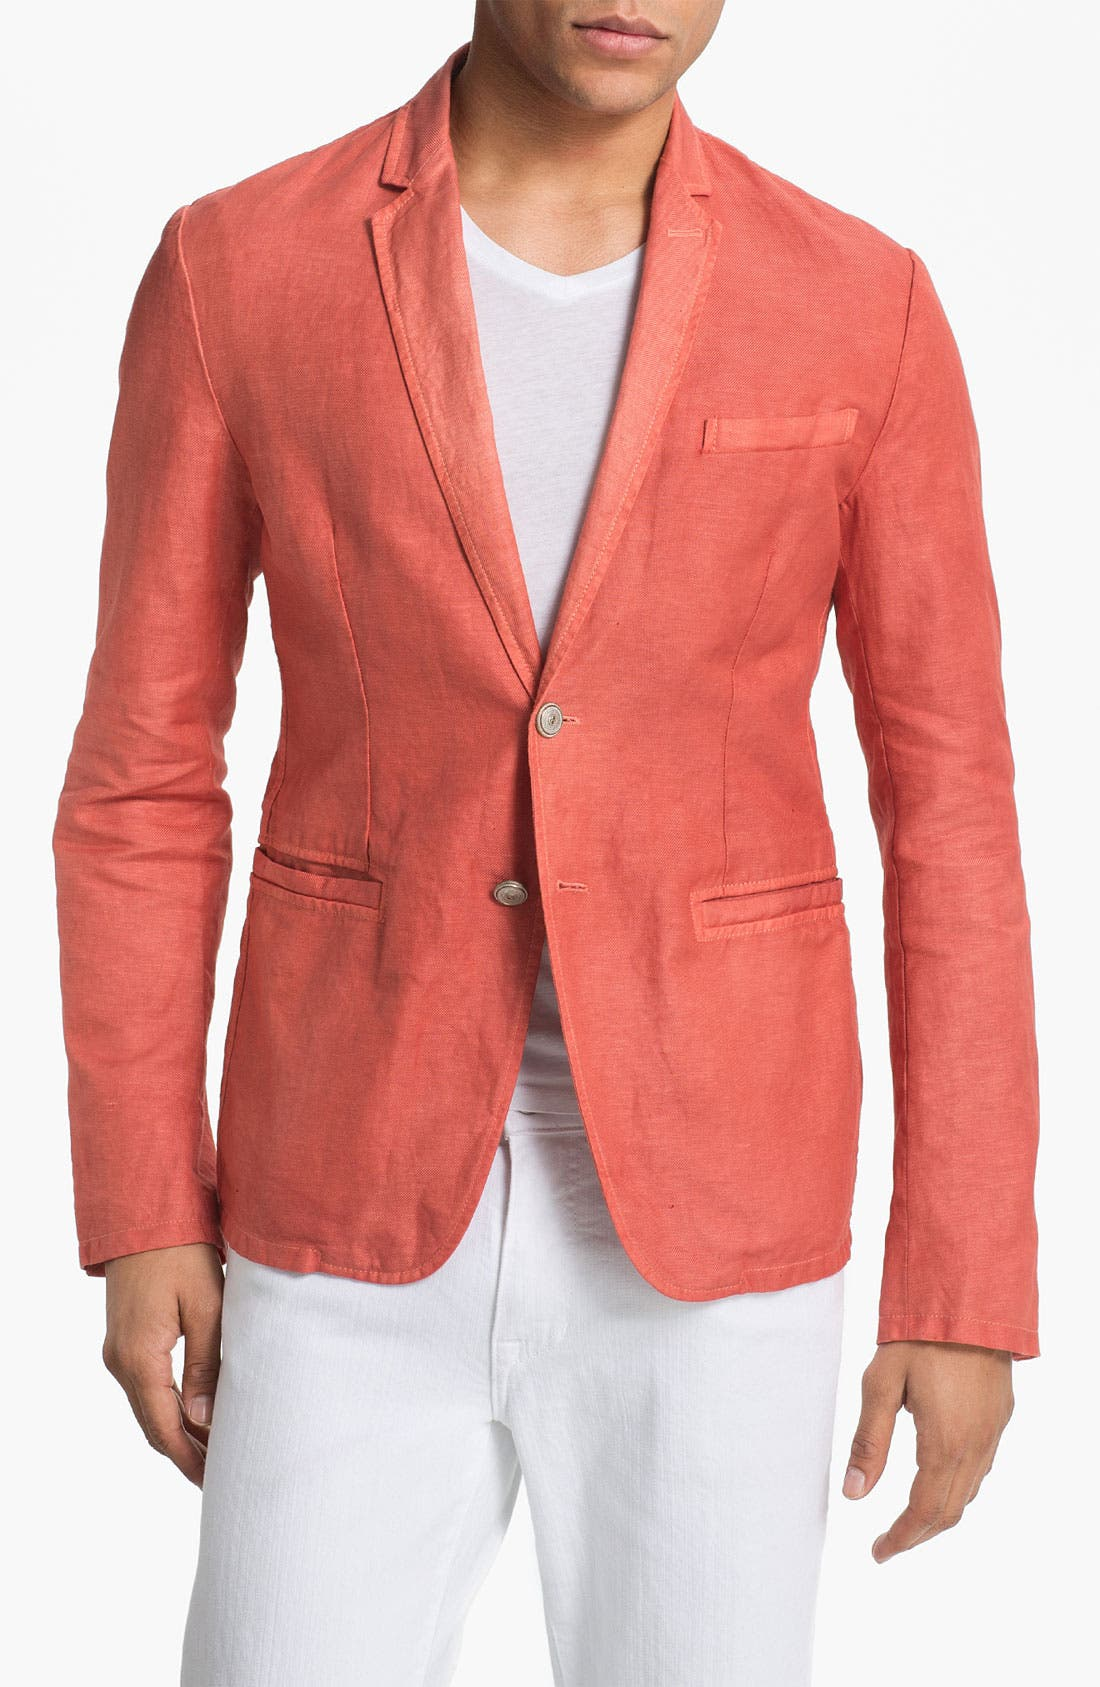 Main Image - Just Cavalli Cotton & Linen Blazer